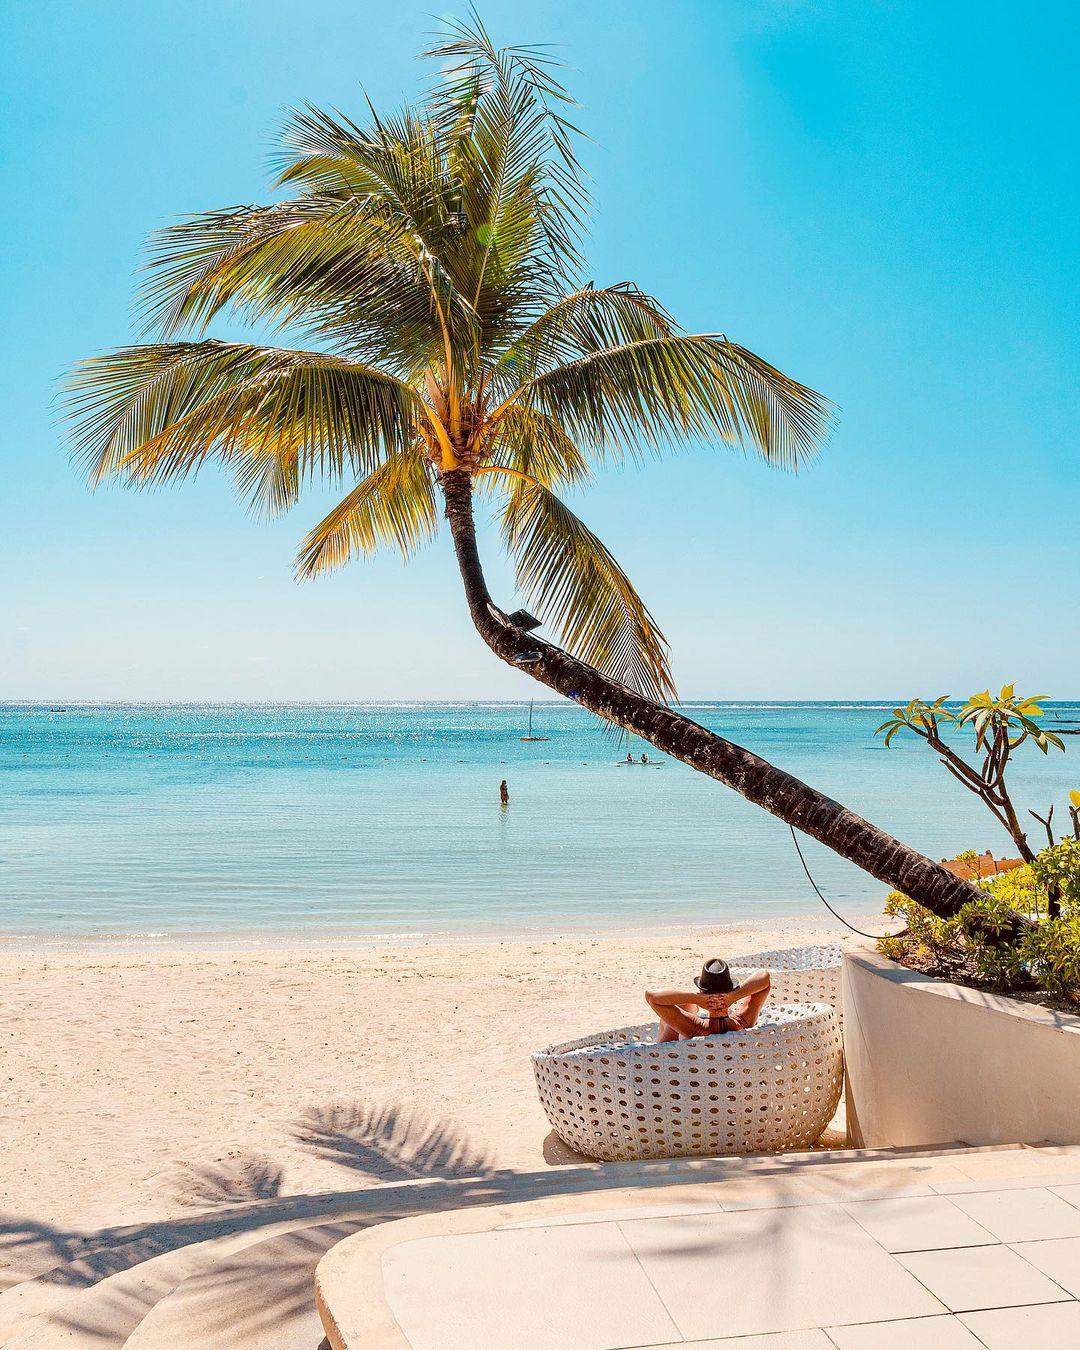 Mauritius hottest destinations in africa